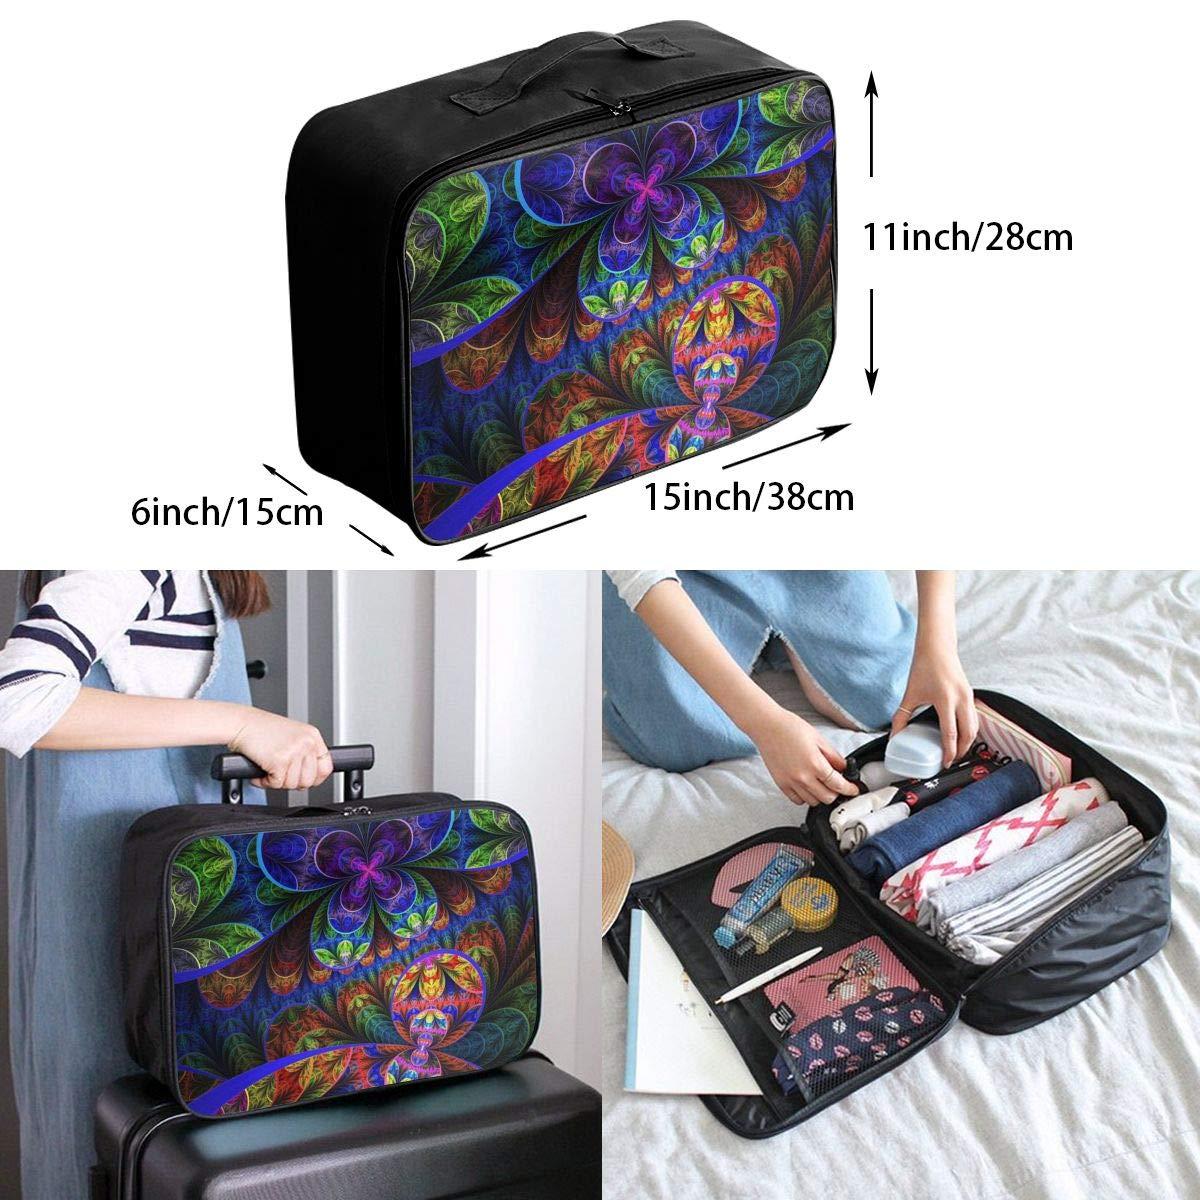 Travel Luggage Duffle Bag Lightweight Portable Handbag Colorful Kaleidoscope Print Large Capacity Waterproof Foldable Storage Tote